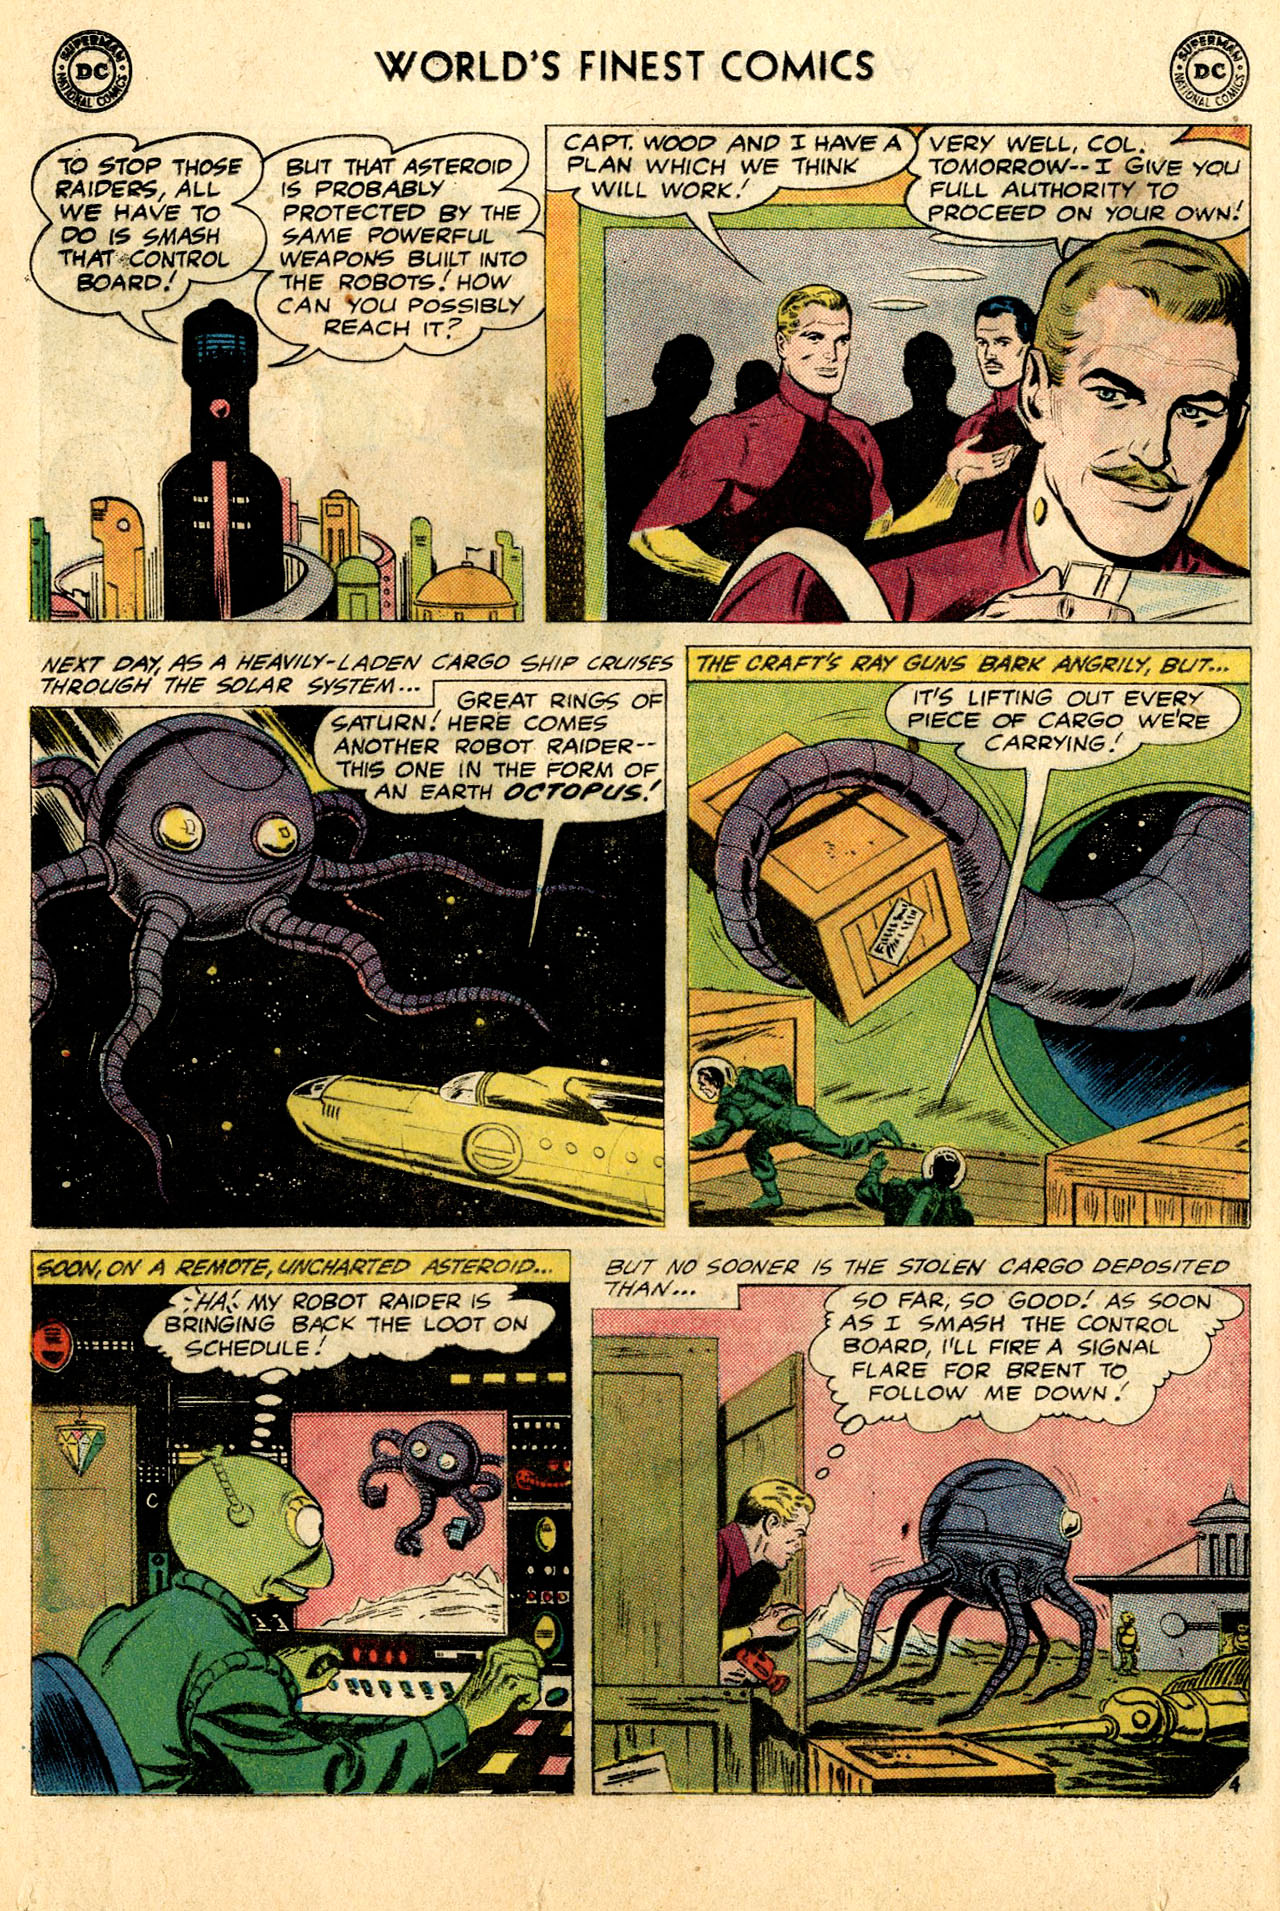 Read online World's Finest Comics comic -  Issue #110 - 20